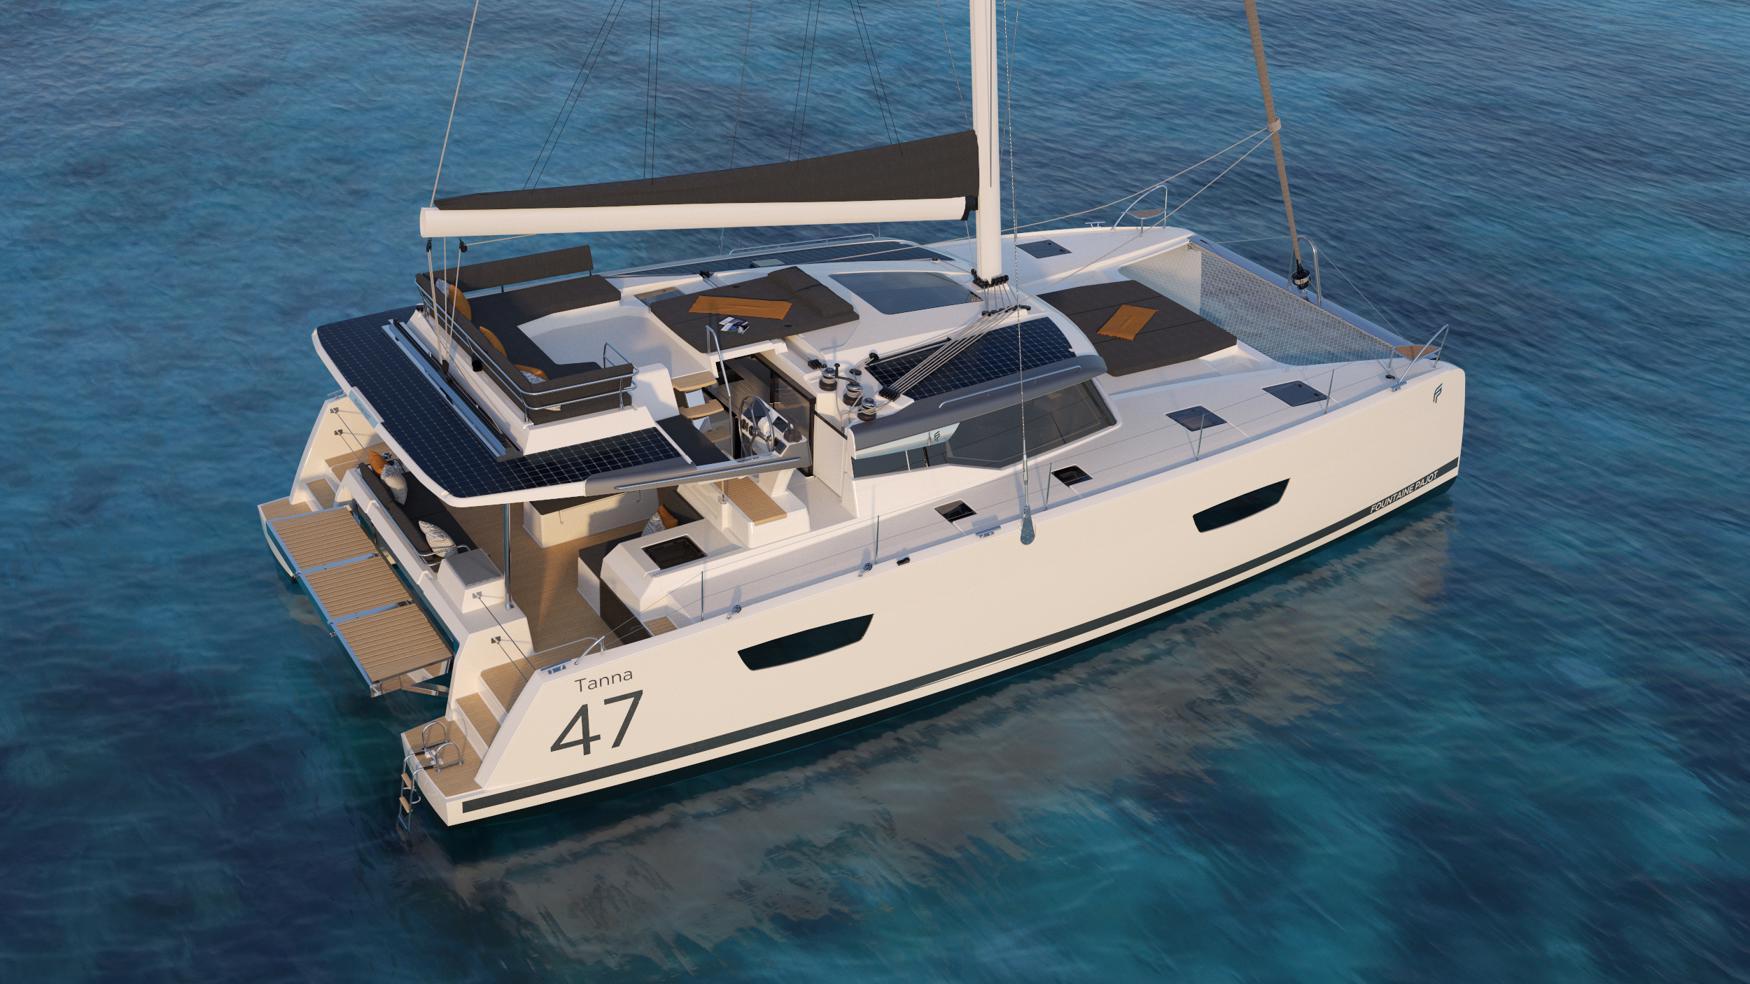 New Tanna 47 - Catamaran